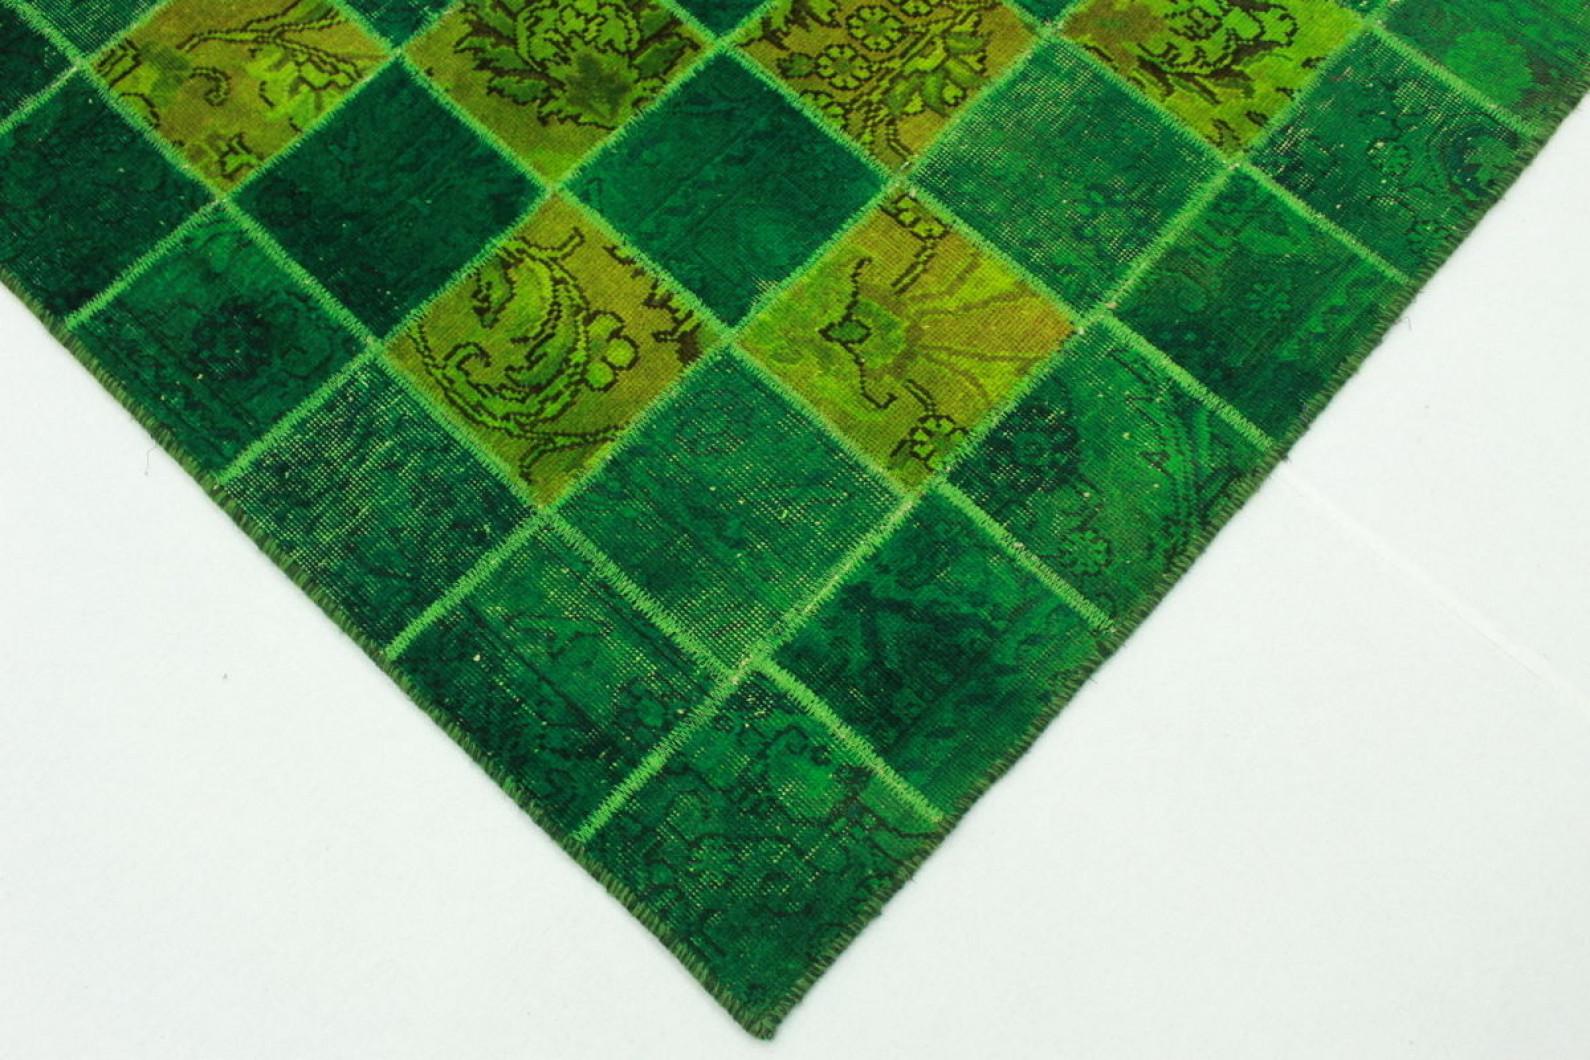 patchwork teppich gr n in 244x160cm 1001 2192 bei. Black Bedroom Furniture Sets. Home Design Ideas